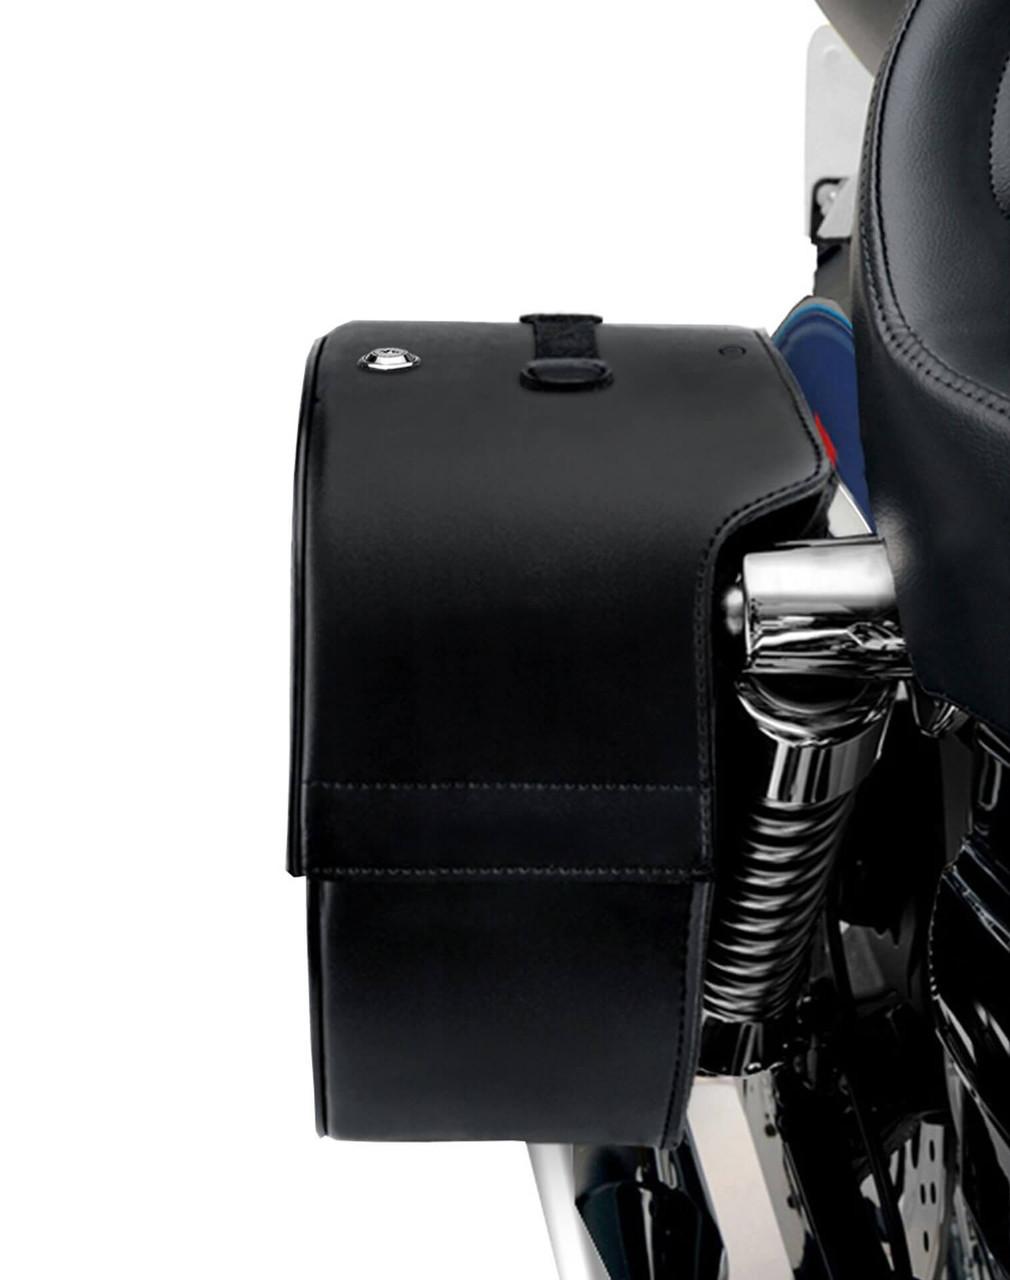 Honda VTX 1300 C Shock Cutout Motorcycle Saddlebags Shock Cutout View